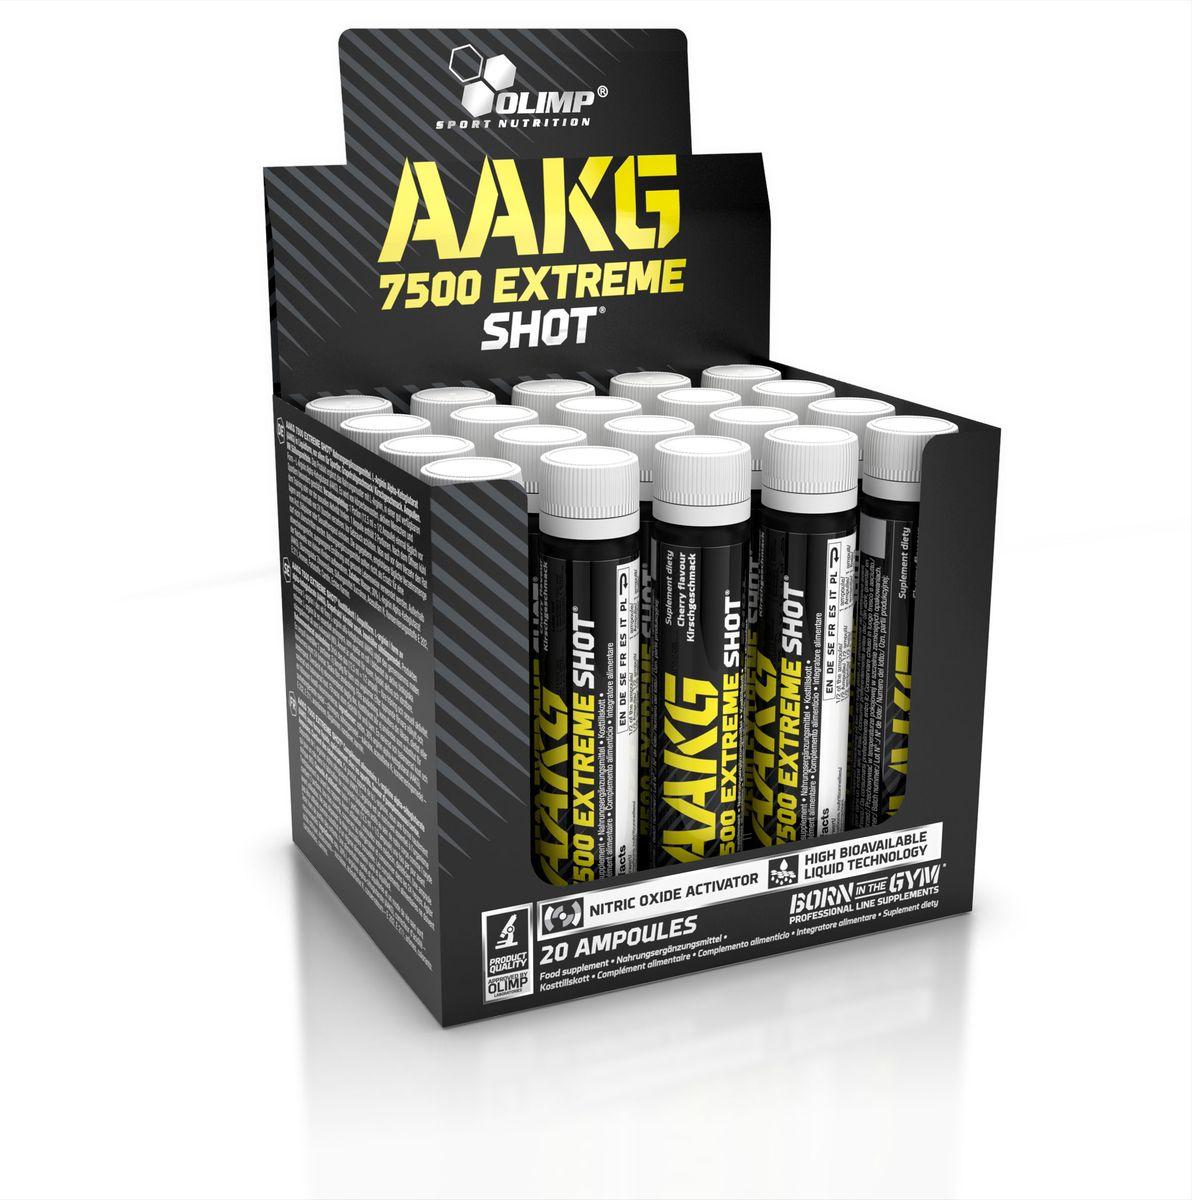 Аргинин Olimp Sport Nutrition  AAKG 7500 Extreme Shot , вишня, 20 х 25 мл - Аминокислоты